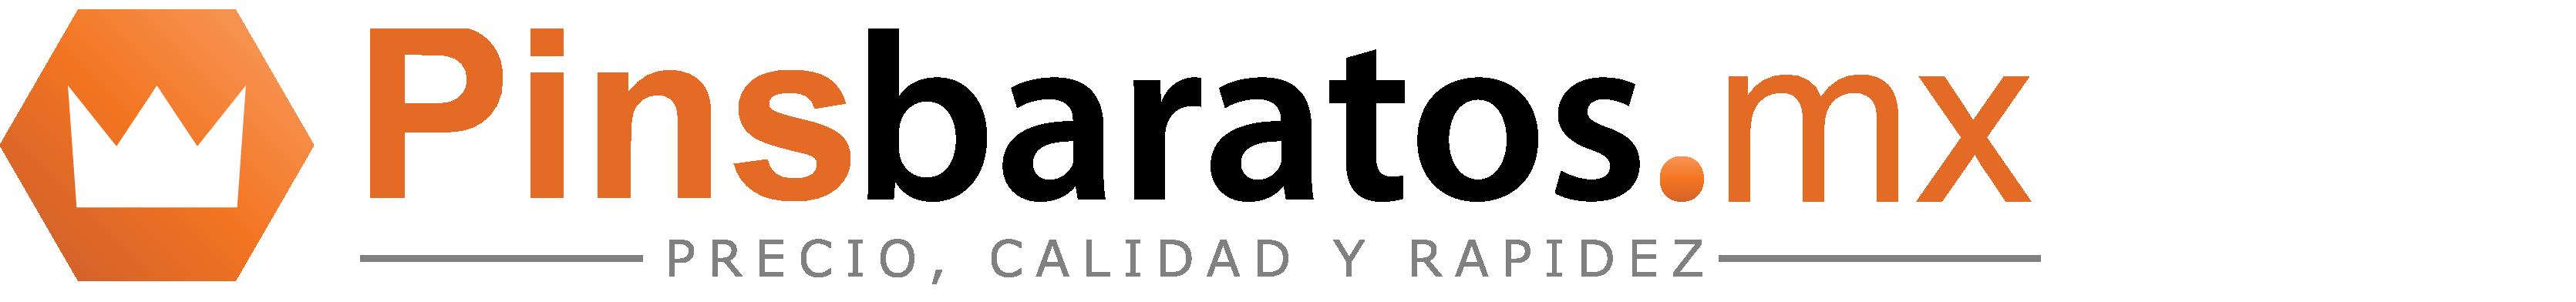 Llaverosbaratos.mx